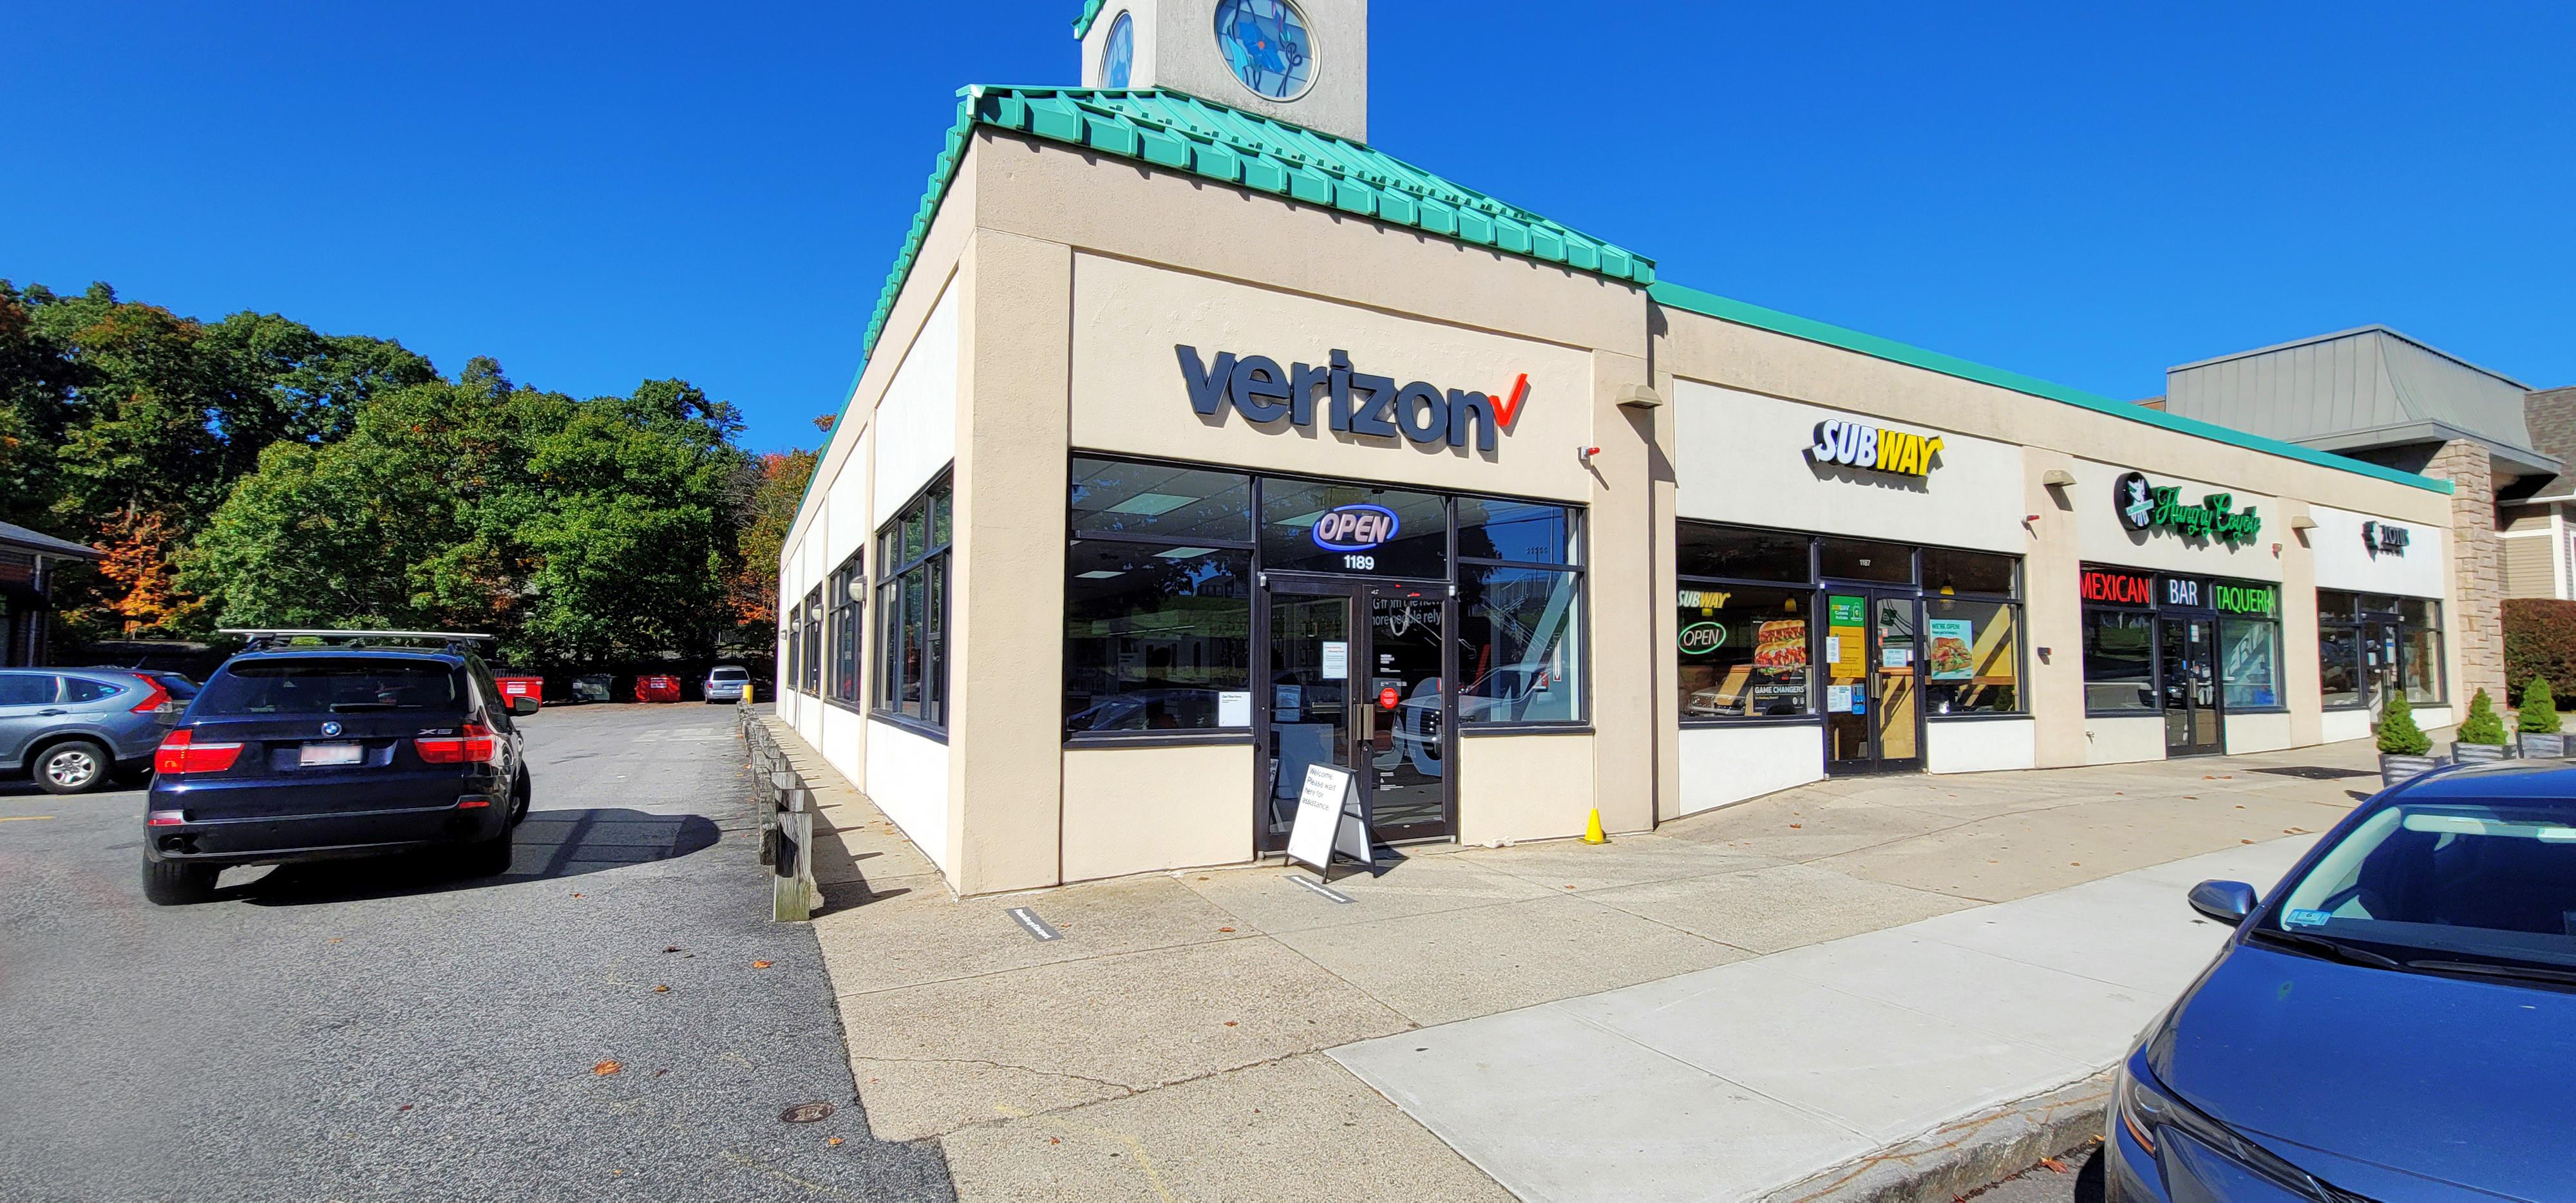 Verizon Authorized Retailer – Needham store image